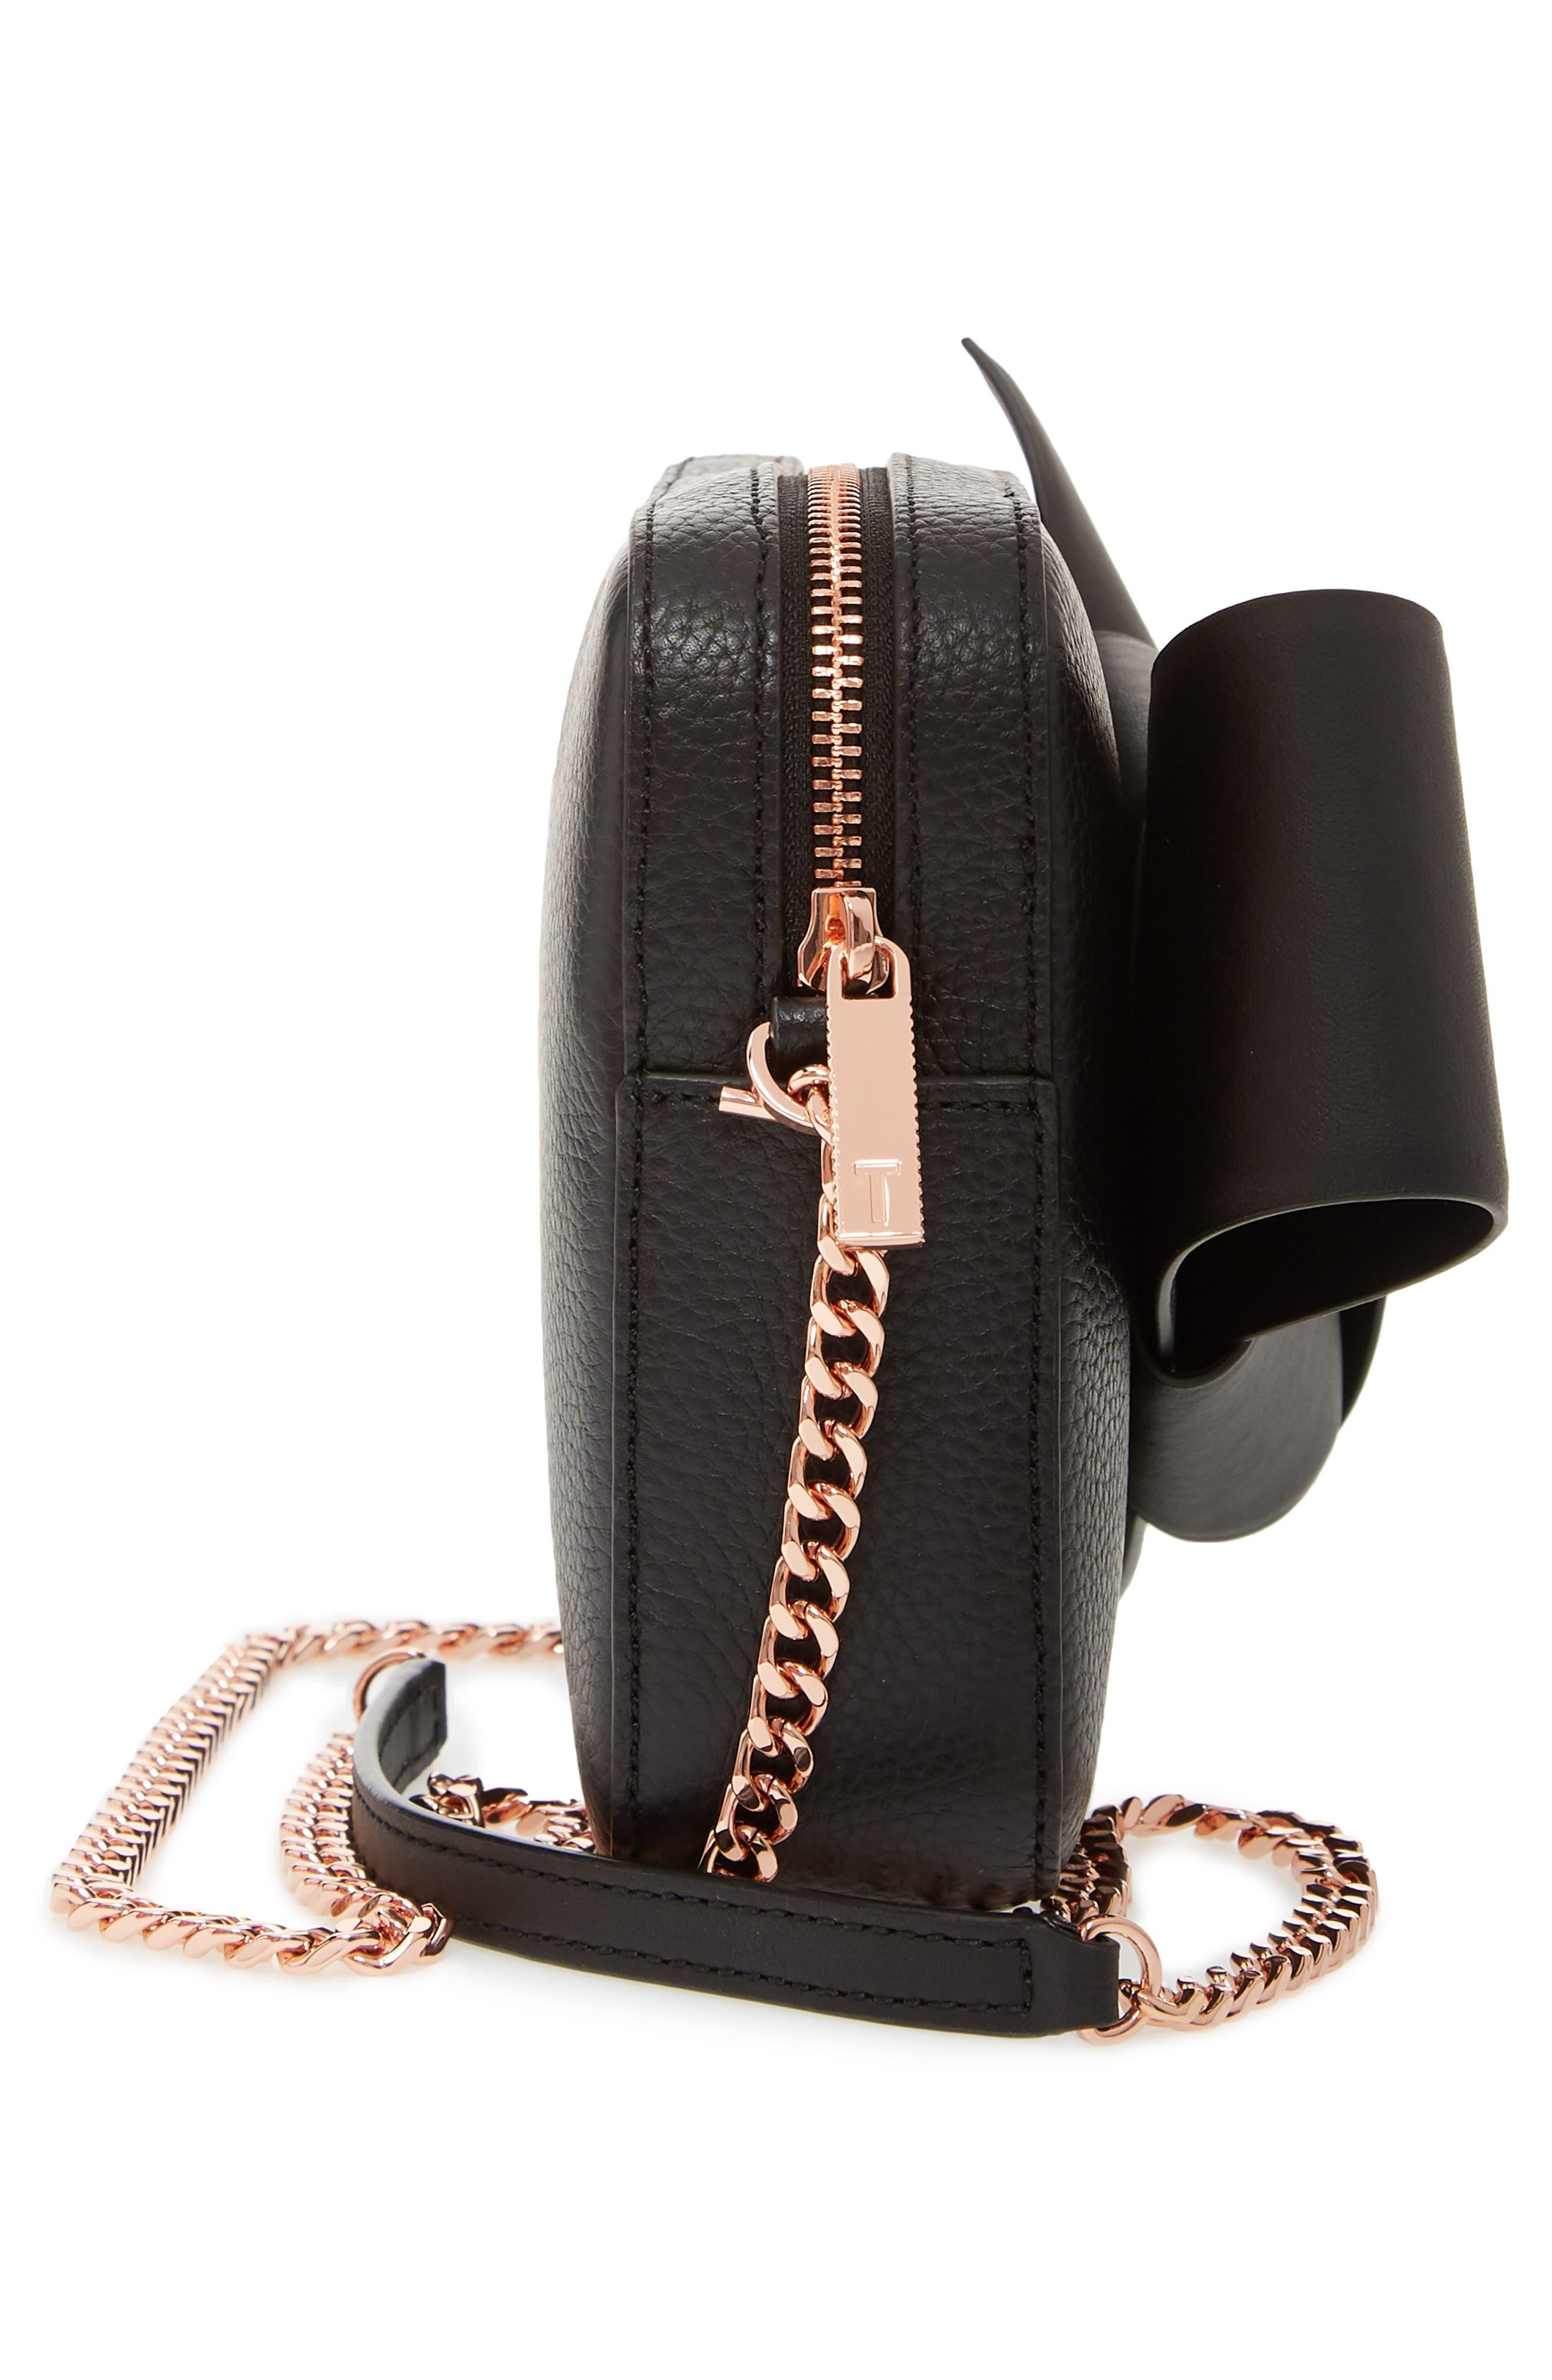 Giant Knot Leather Camera Bag,                             Alternate thumbnail 5, color,                             BLACK